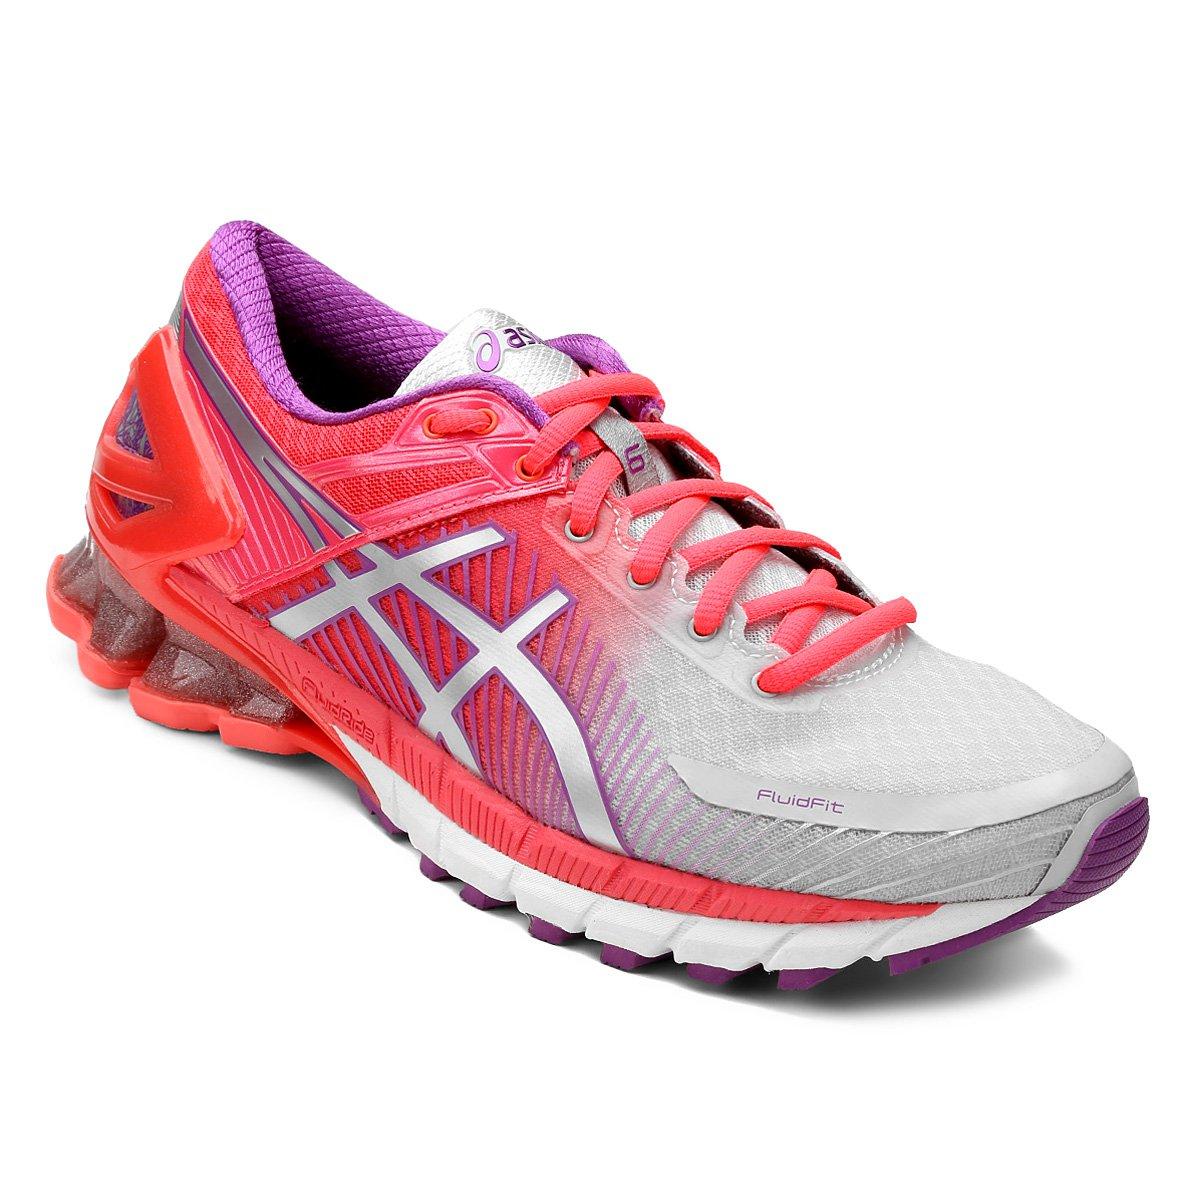 Tênis Asics Gel Kinsei 6 Feminino - Pink e Cinza - Compre Agora ... ab9d158a0c225